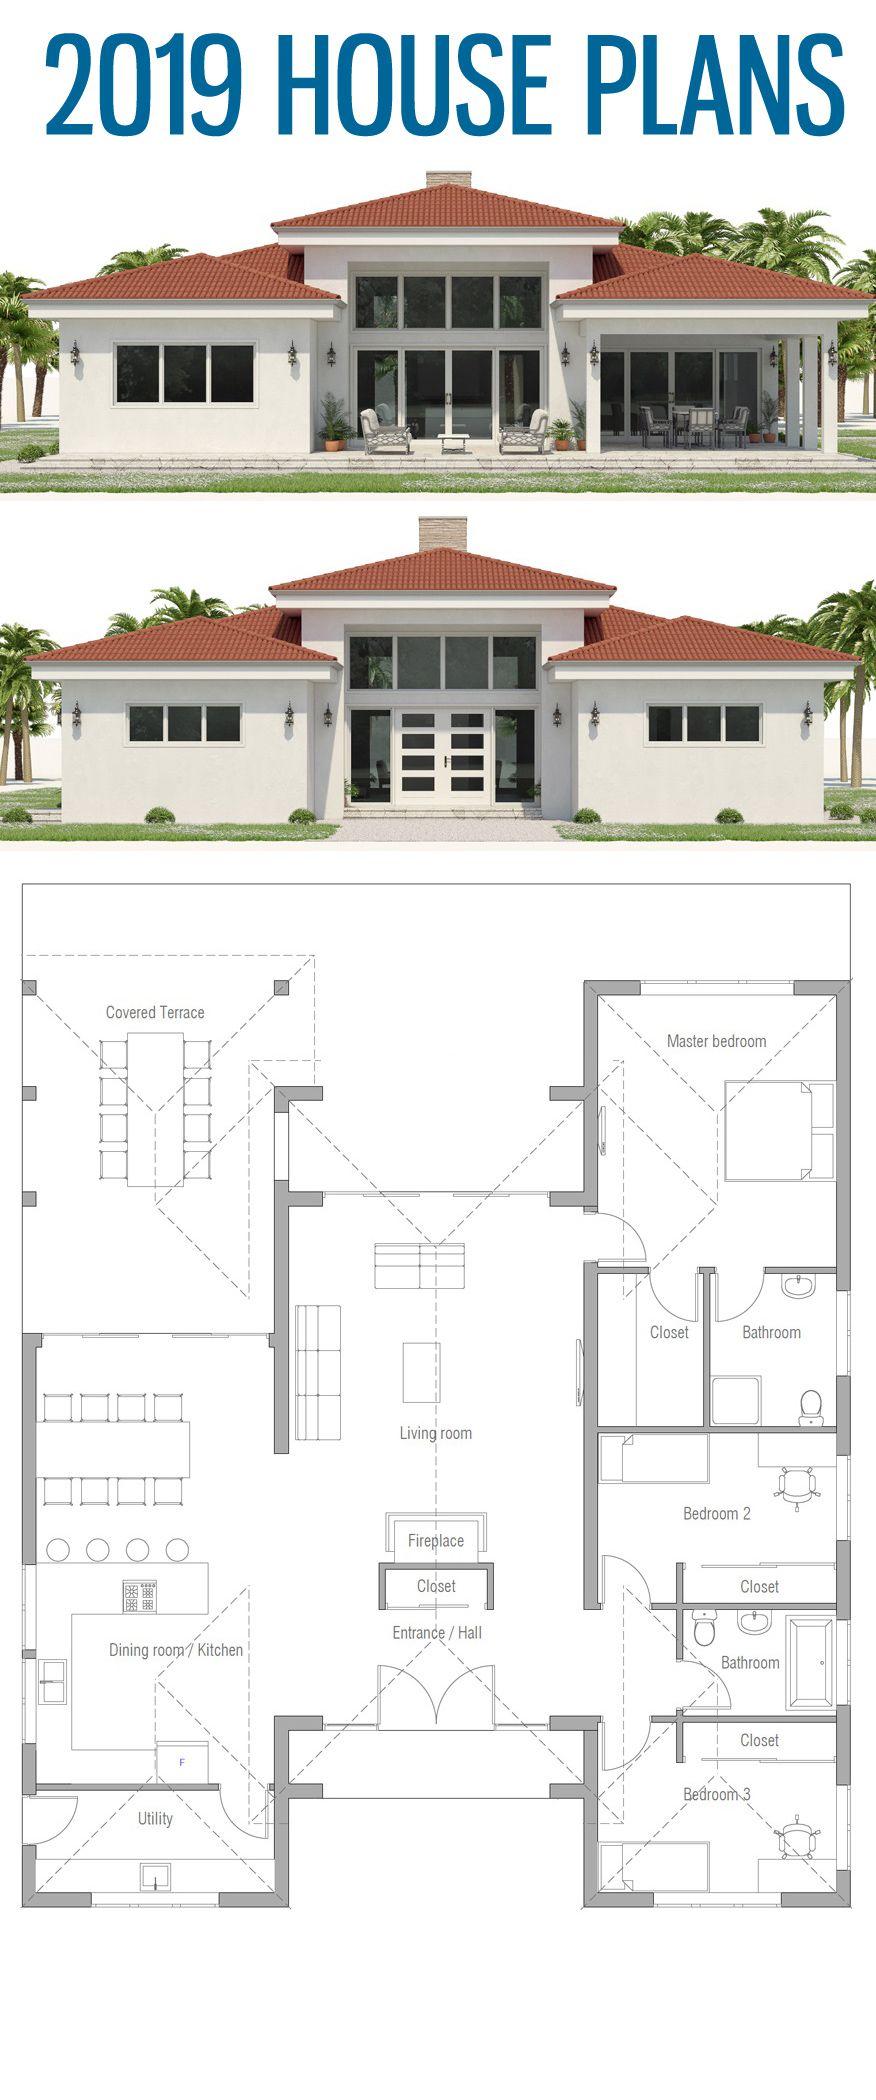 Small House Plan Small Home Plans House Plans 2019 House Layouts Sims House Plans New House Plans